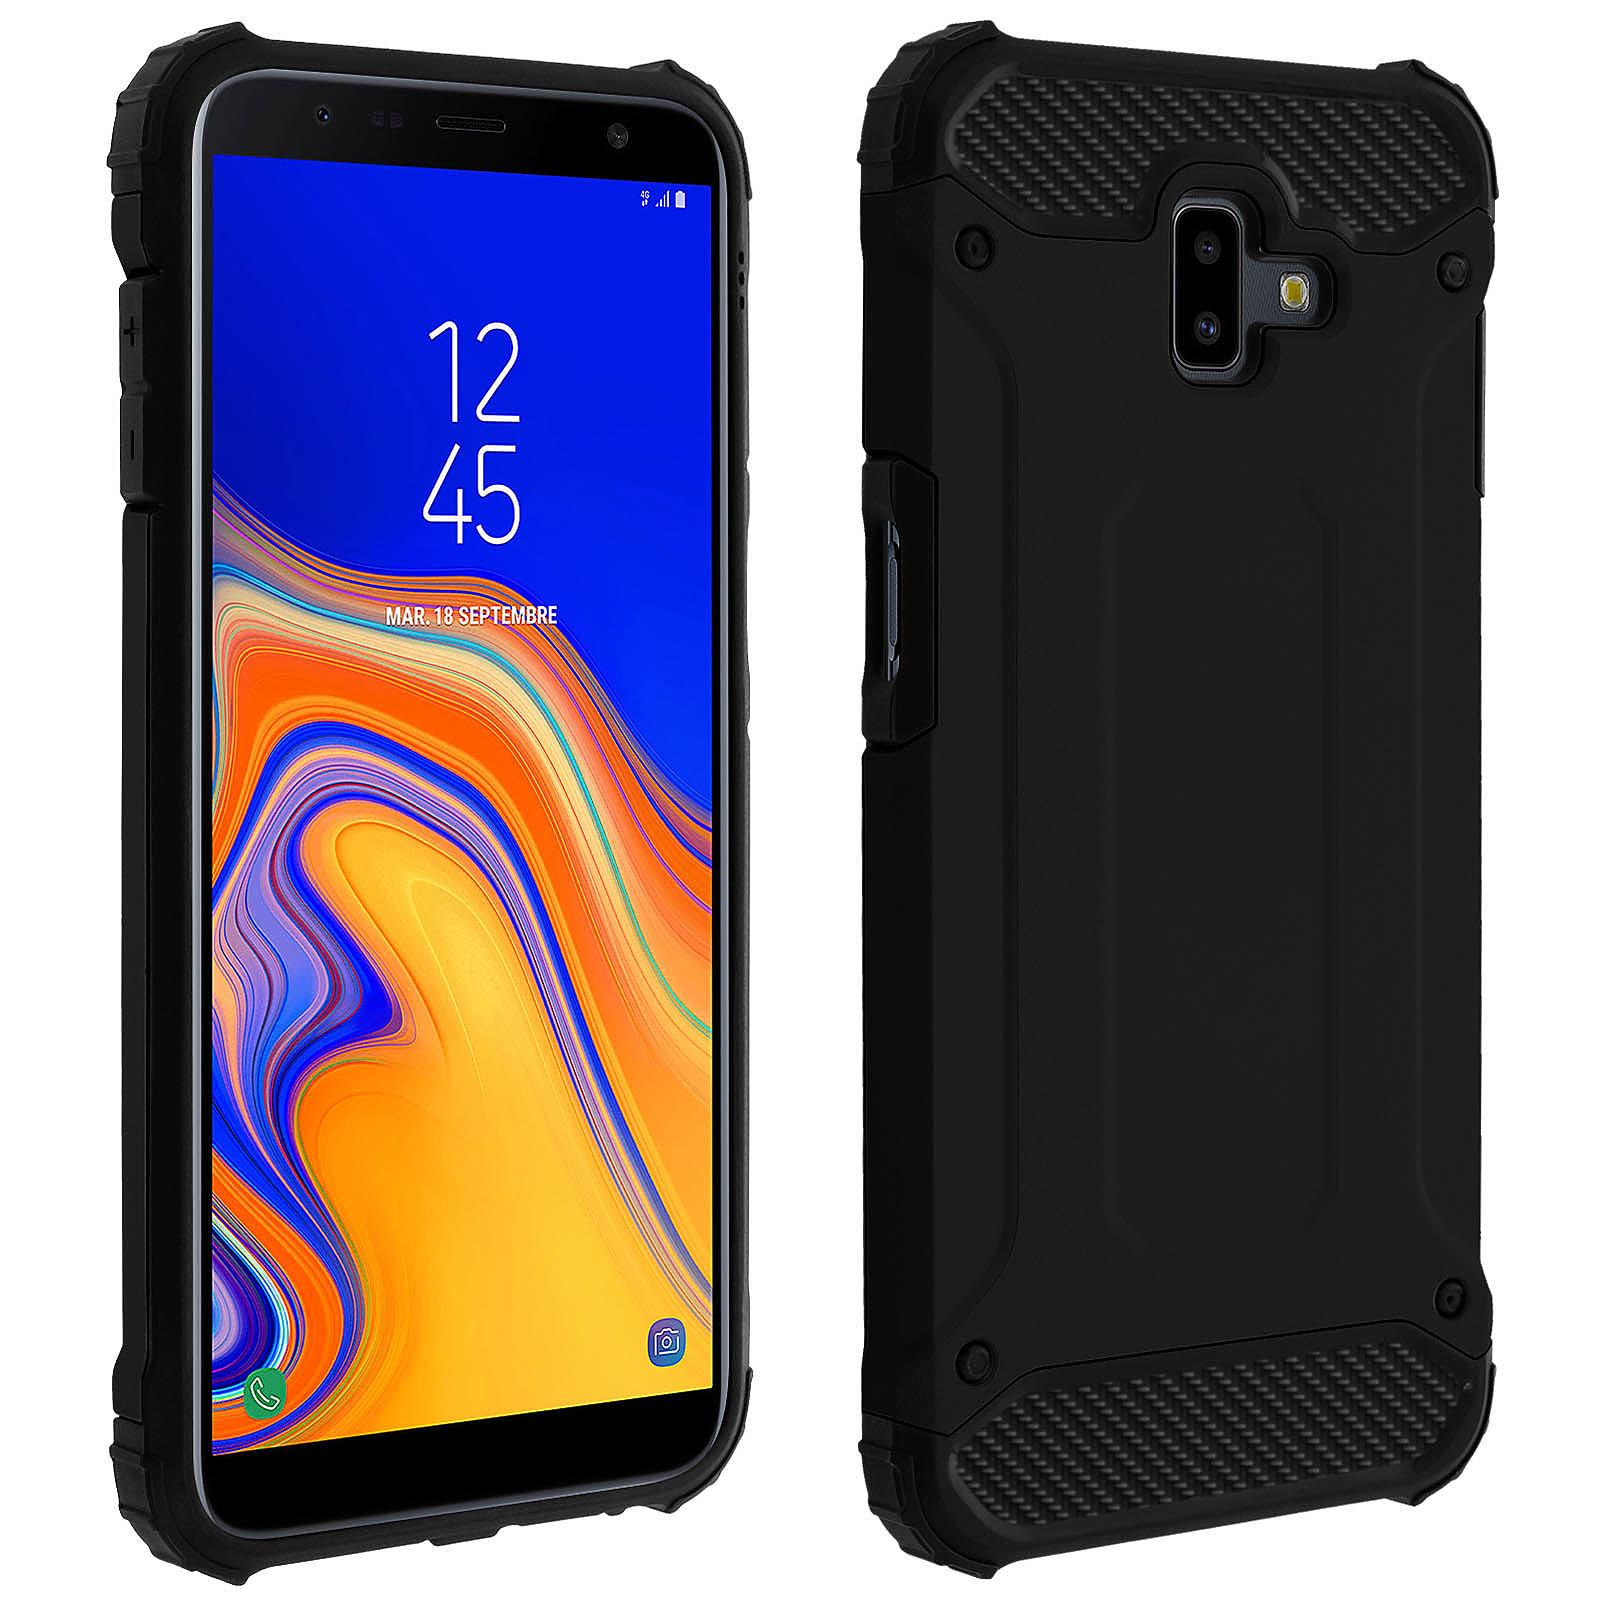 Avizar Coque Noir pour Samsung Galaxy J6 Plus